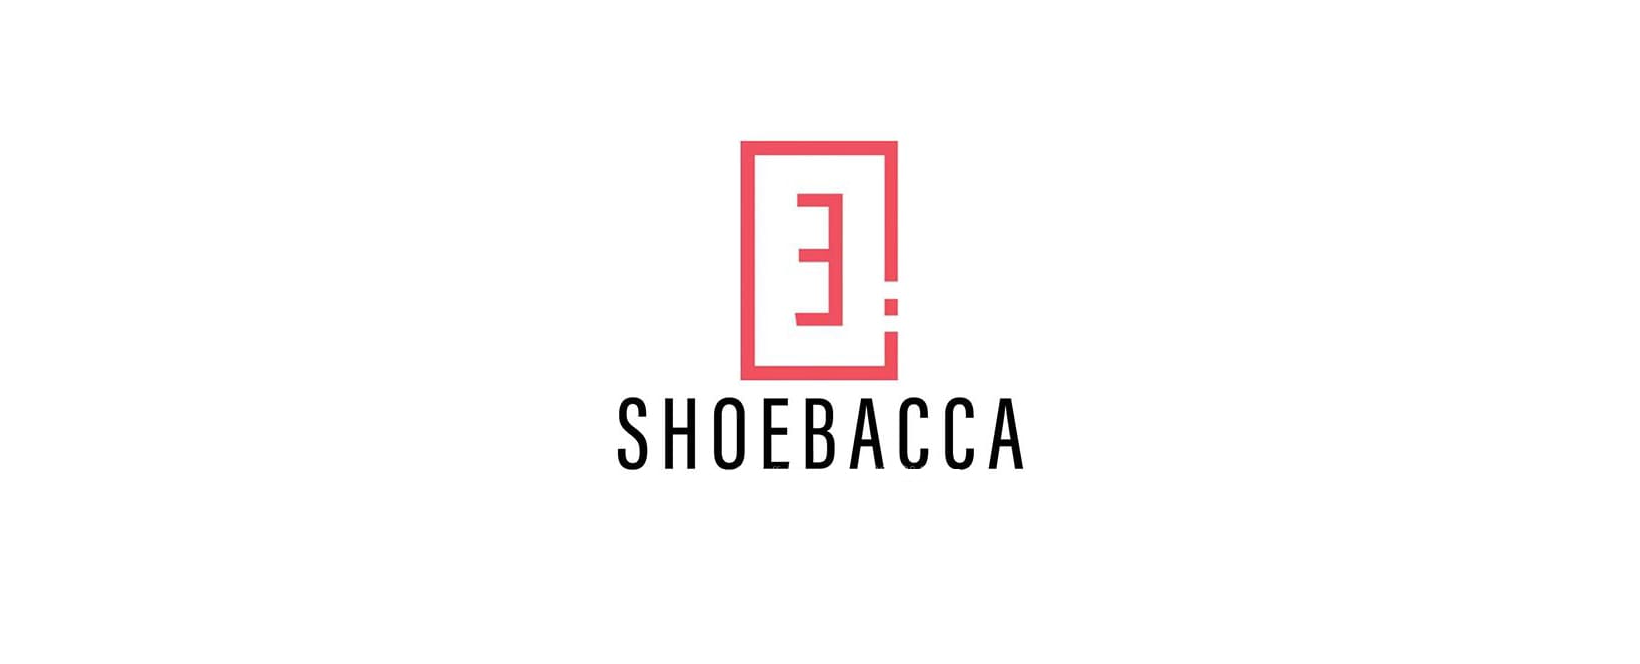 Shoebacca Discount Code 2021